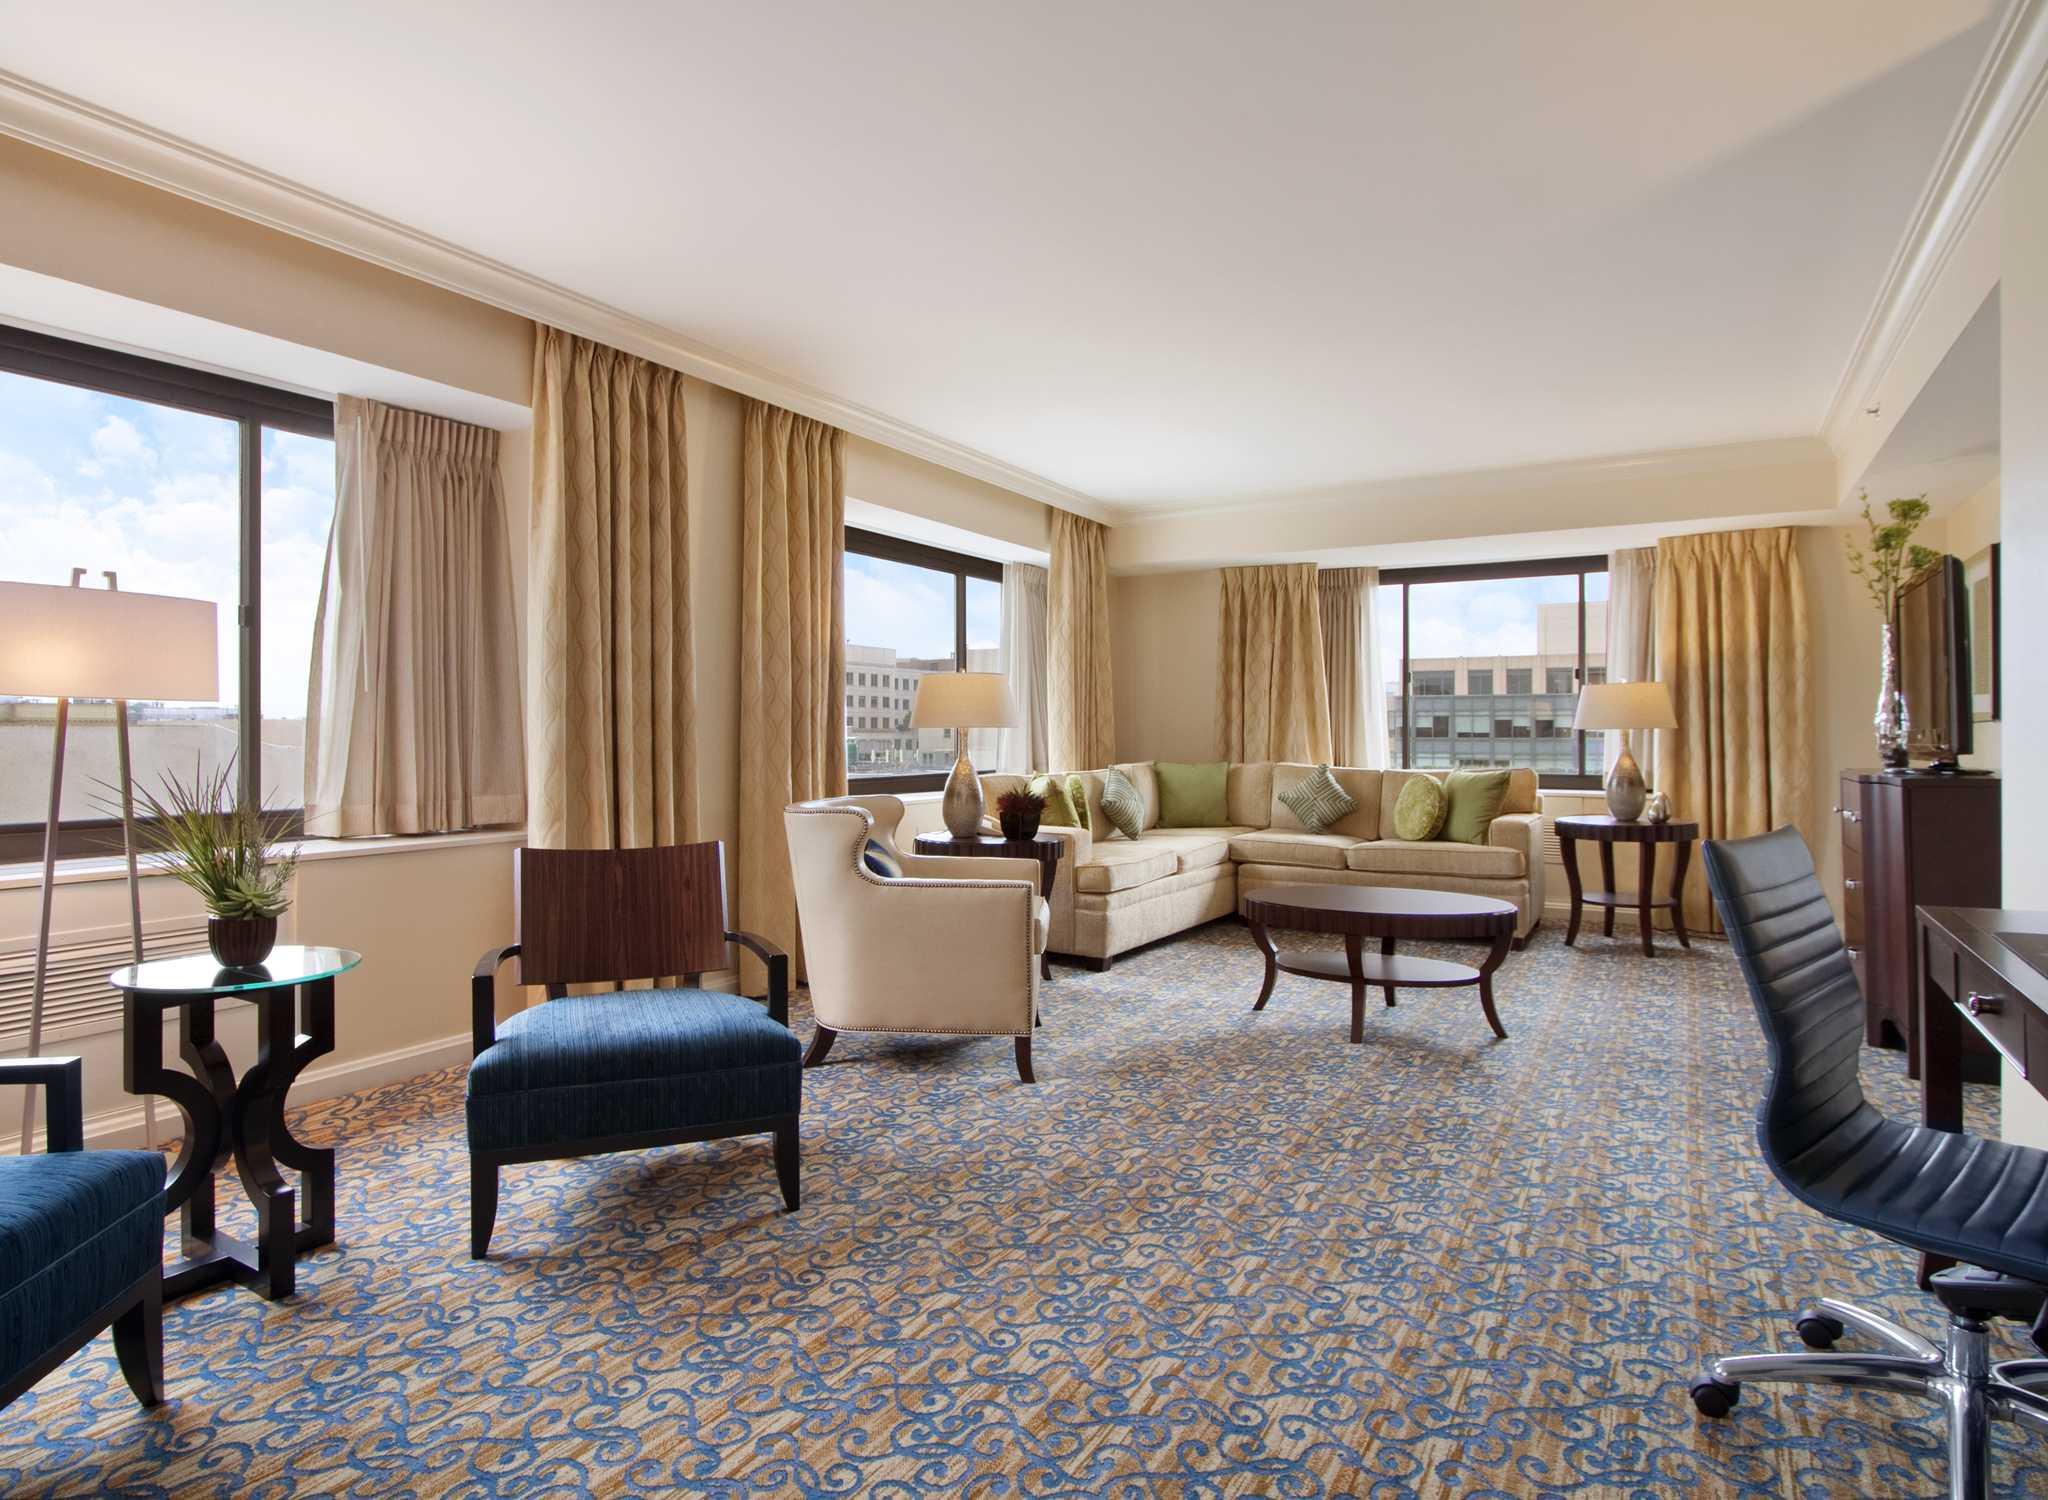 Muebles Hilton Capital Federal - Hoteles En El Centro De La Ciudad De Washington Dc Hotel De Lujo [mjhdah]http://www.hiltonhotels.com/assets/img/Hotel%20Images/Hilton/D/DCASHHH/DCASHHH_meetings_full_senateroom.jpg